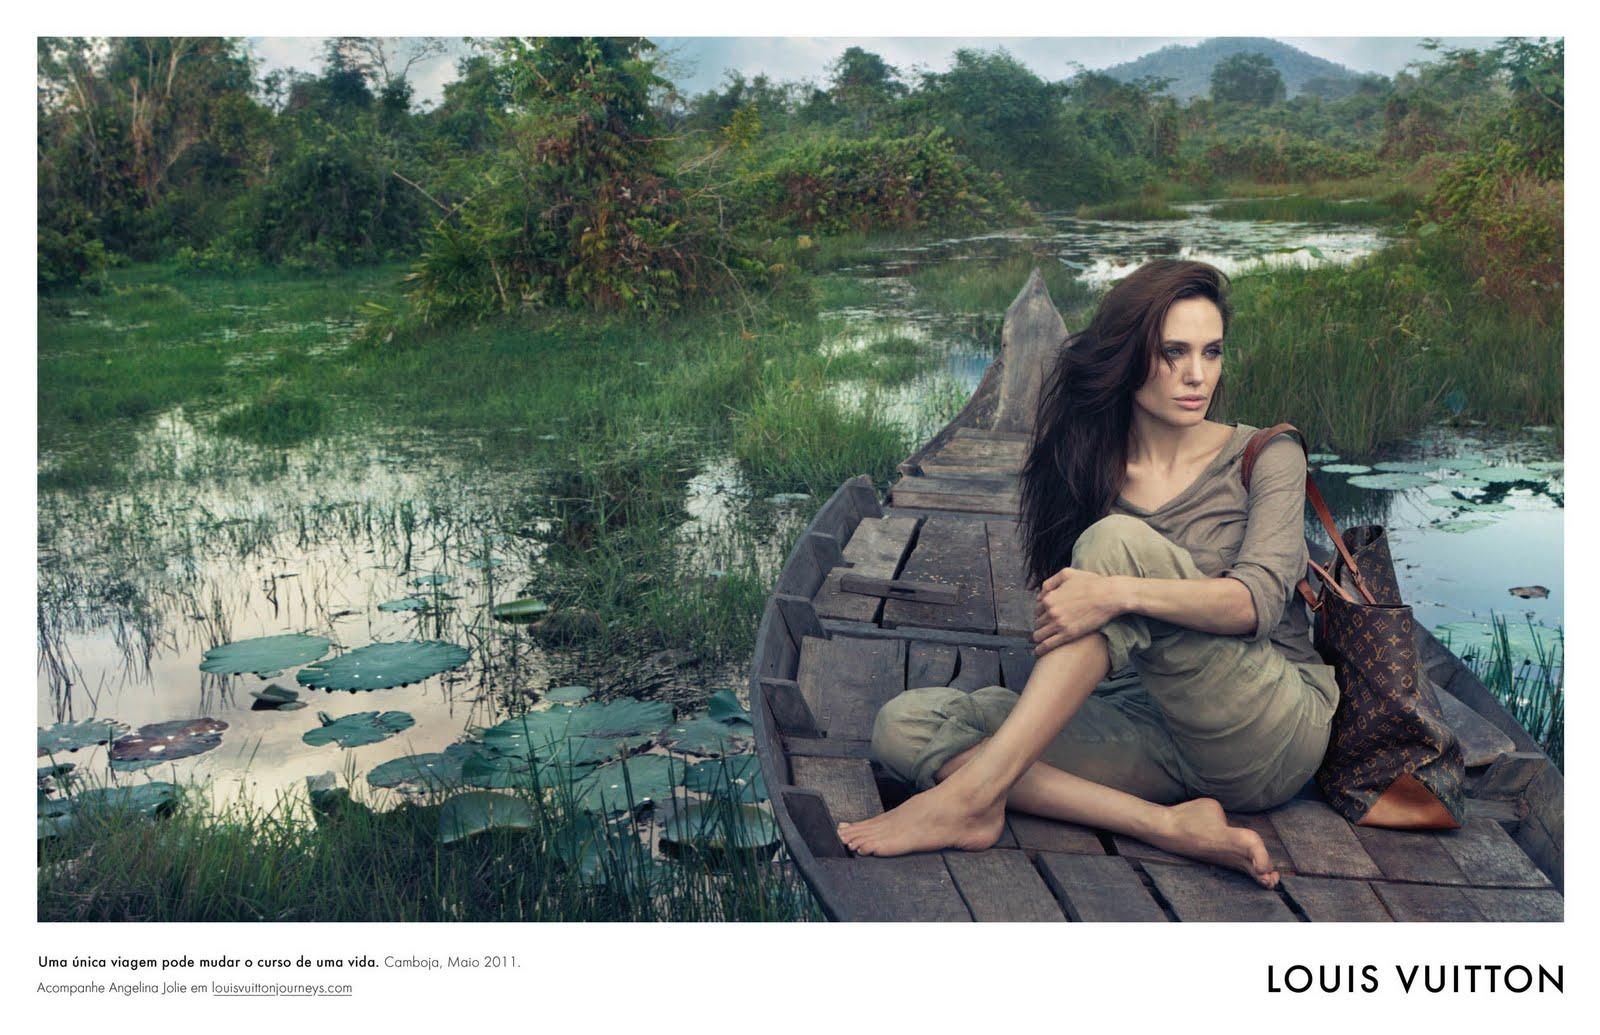 http://3.bp.blogspot.com/-7z9TuscFwLE/TiIjQWi6FyI/AAAAAAAAC2I/t80Hvm6ignU/s1600/Angelina-Jolie.jpg